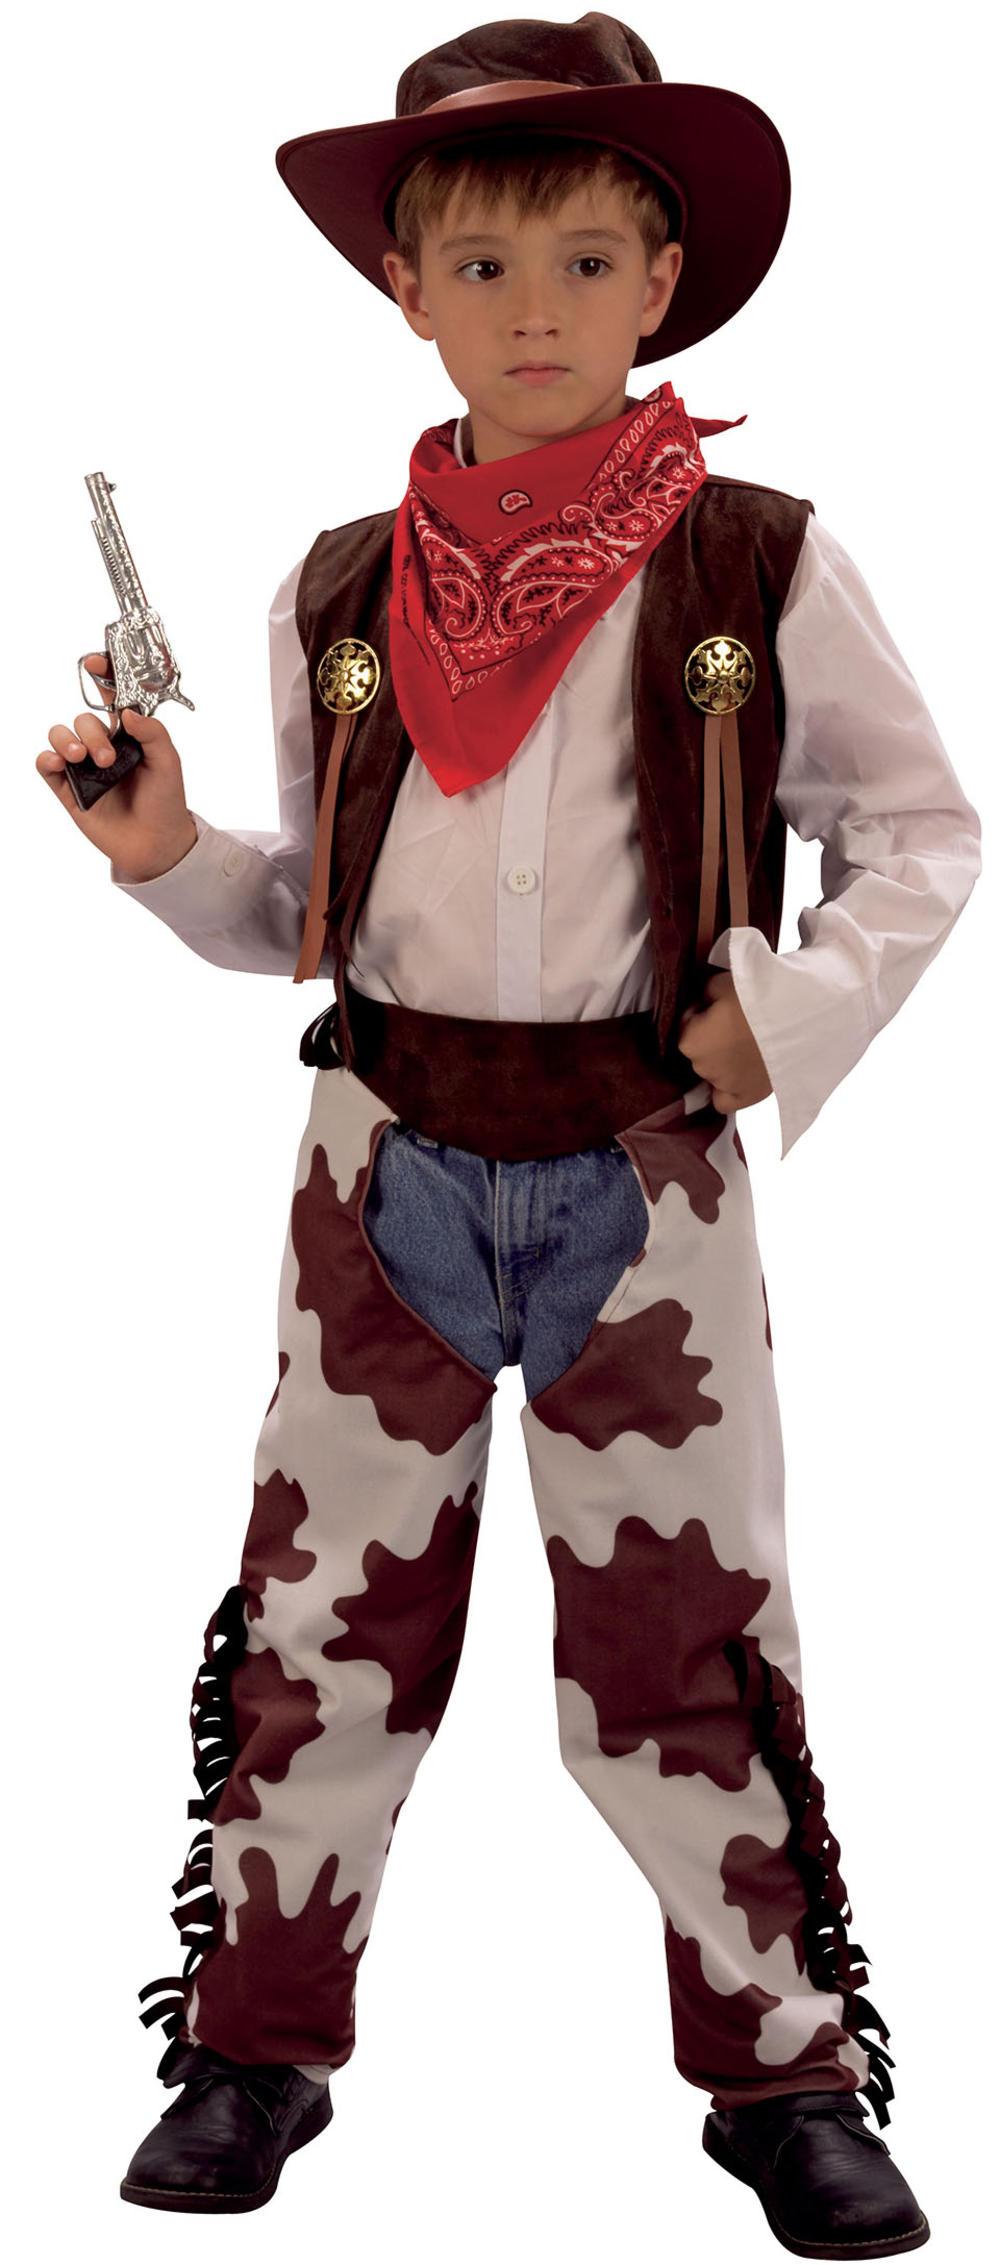 Cowboy Boys Western Fancy Dress Kids Wild Western Childs Costume Outfit + Hat